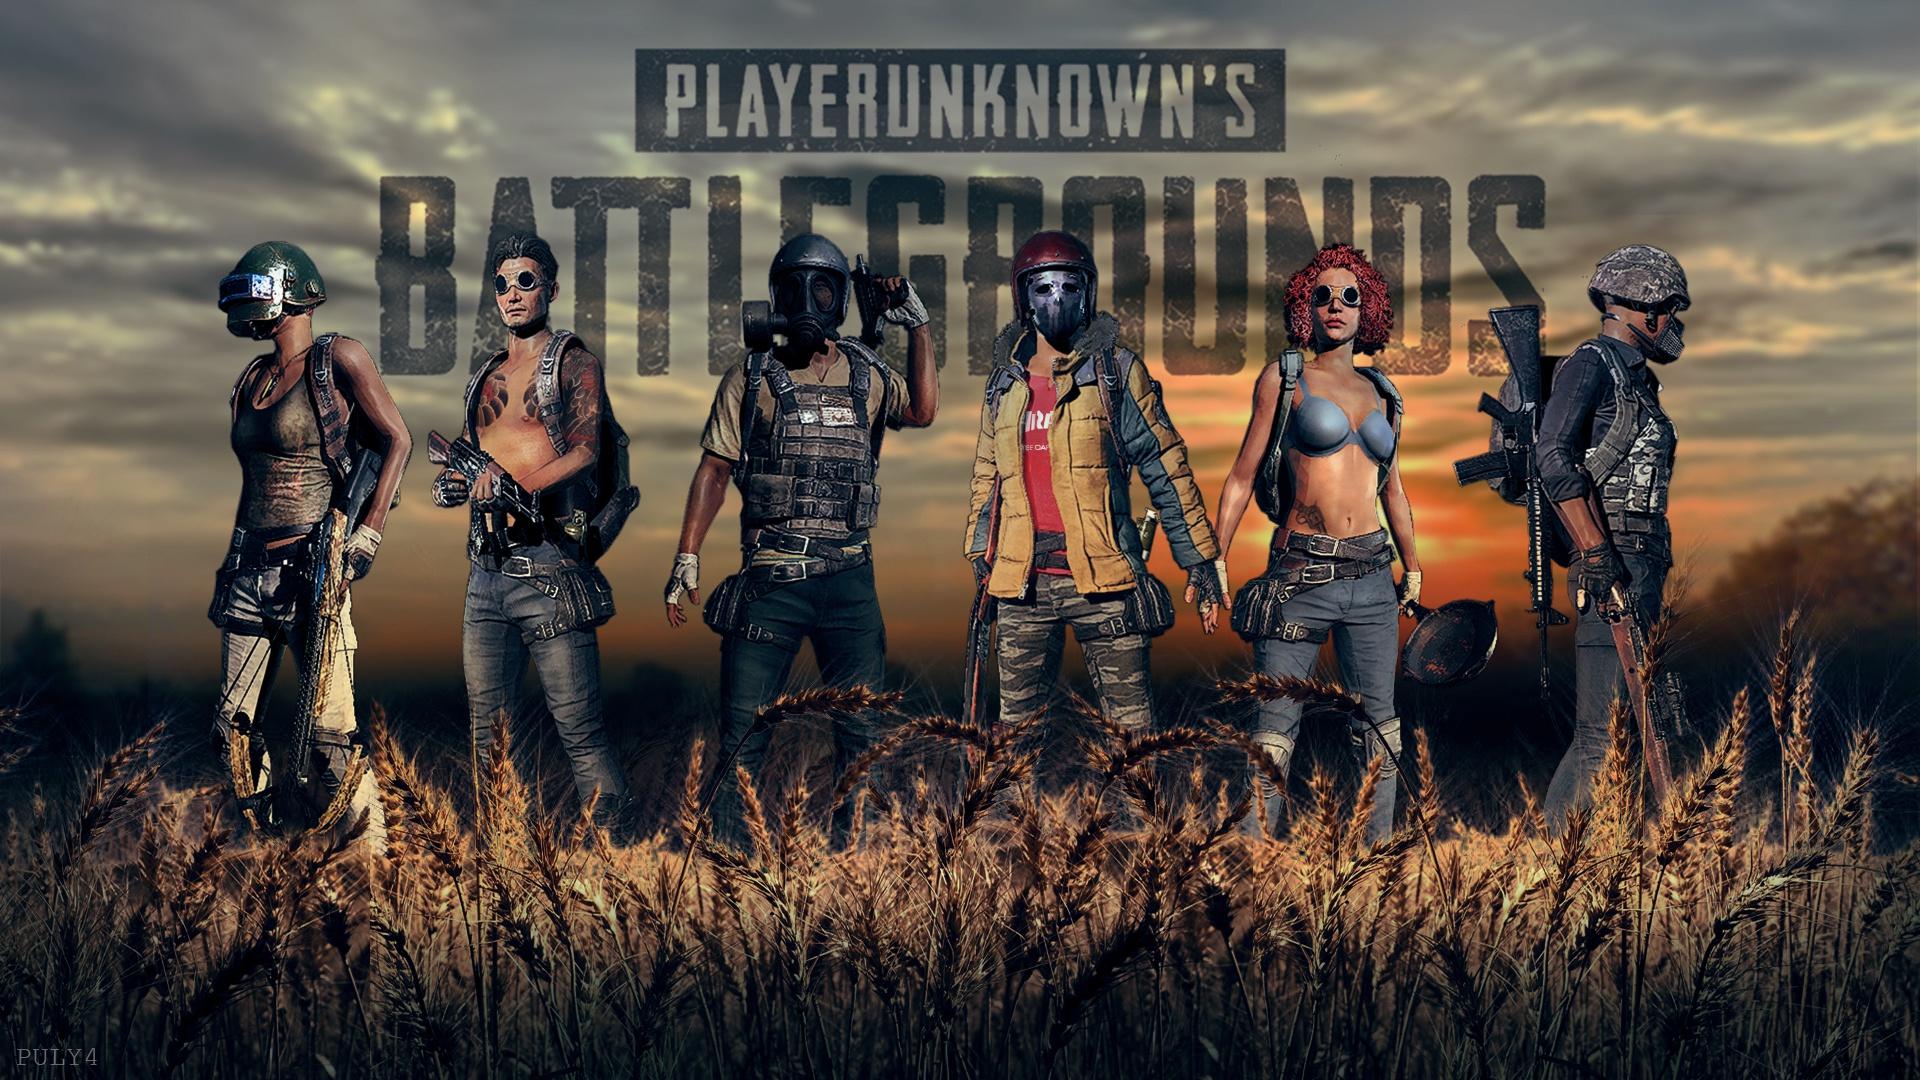 PUBG Video Games Playerunknownu0027s Battlegrounds